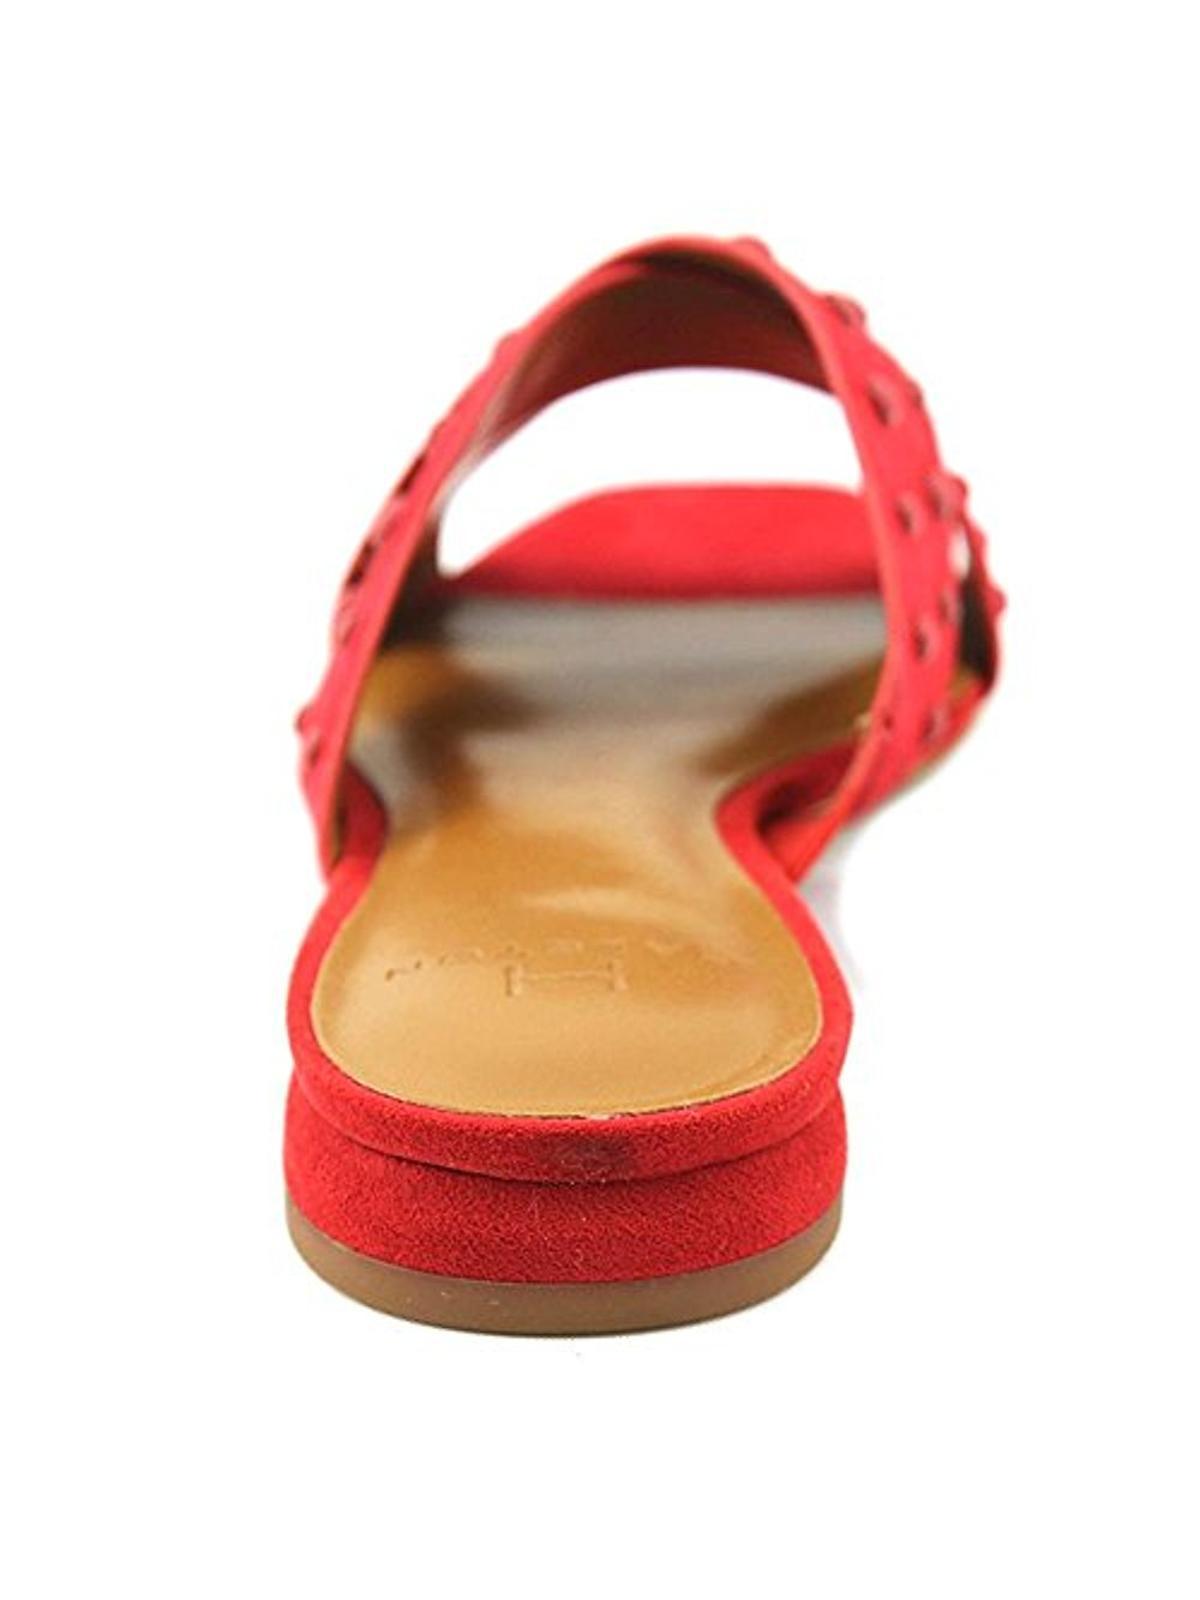 B,M H Halston Womens Nora Dress Square Toe Slide Sandals Pink 6.5 Medium